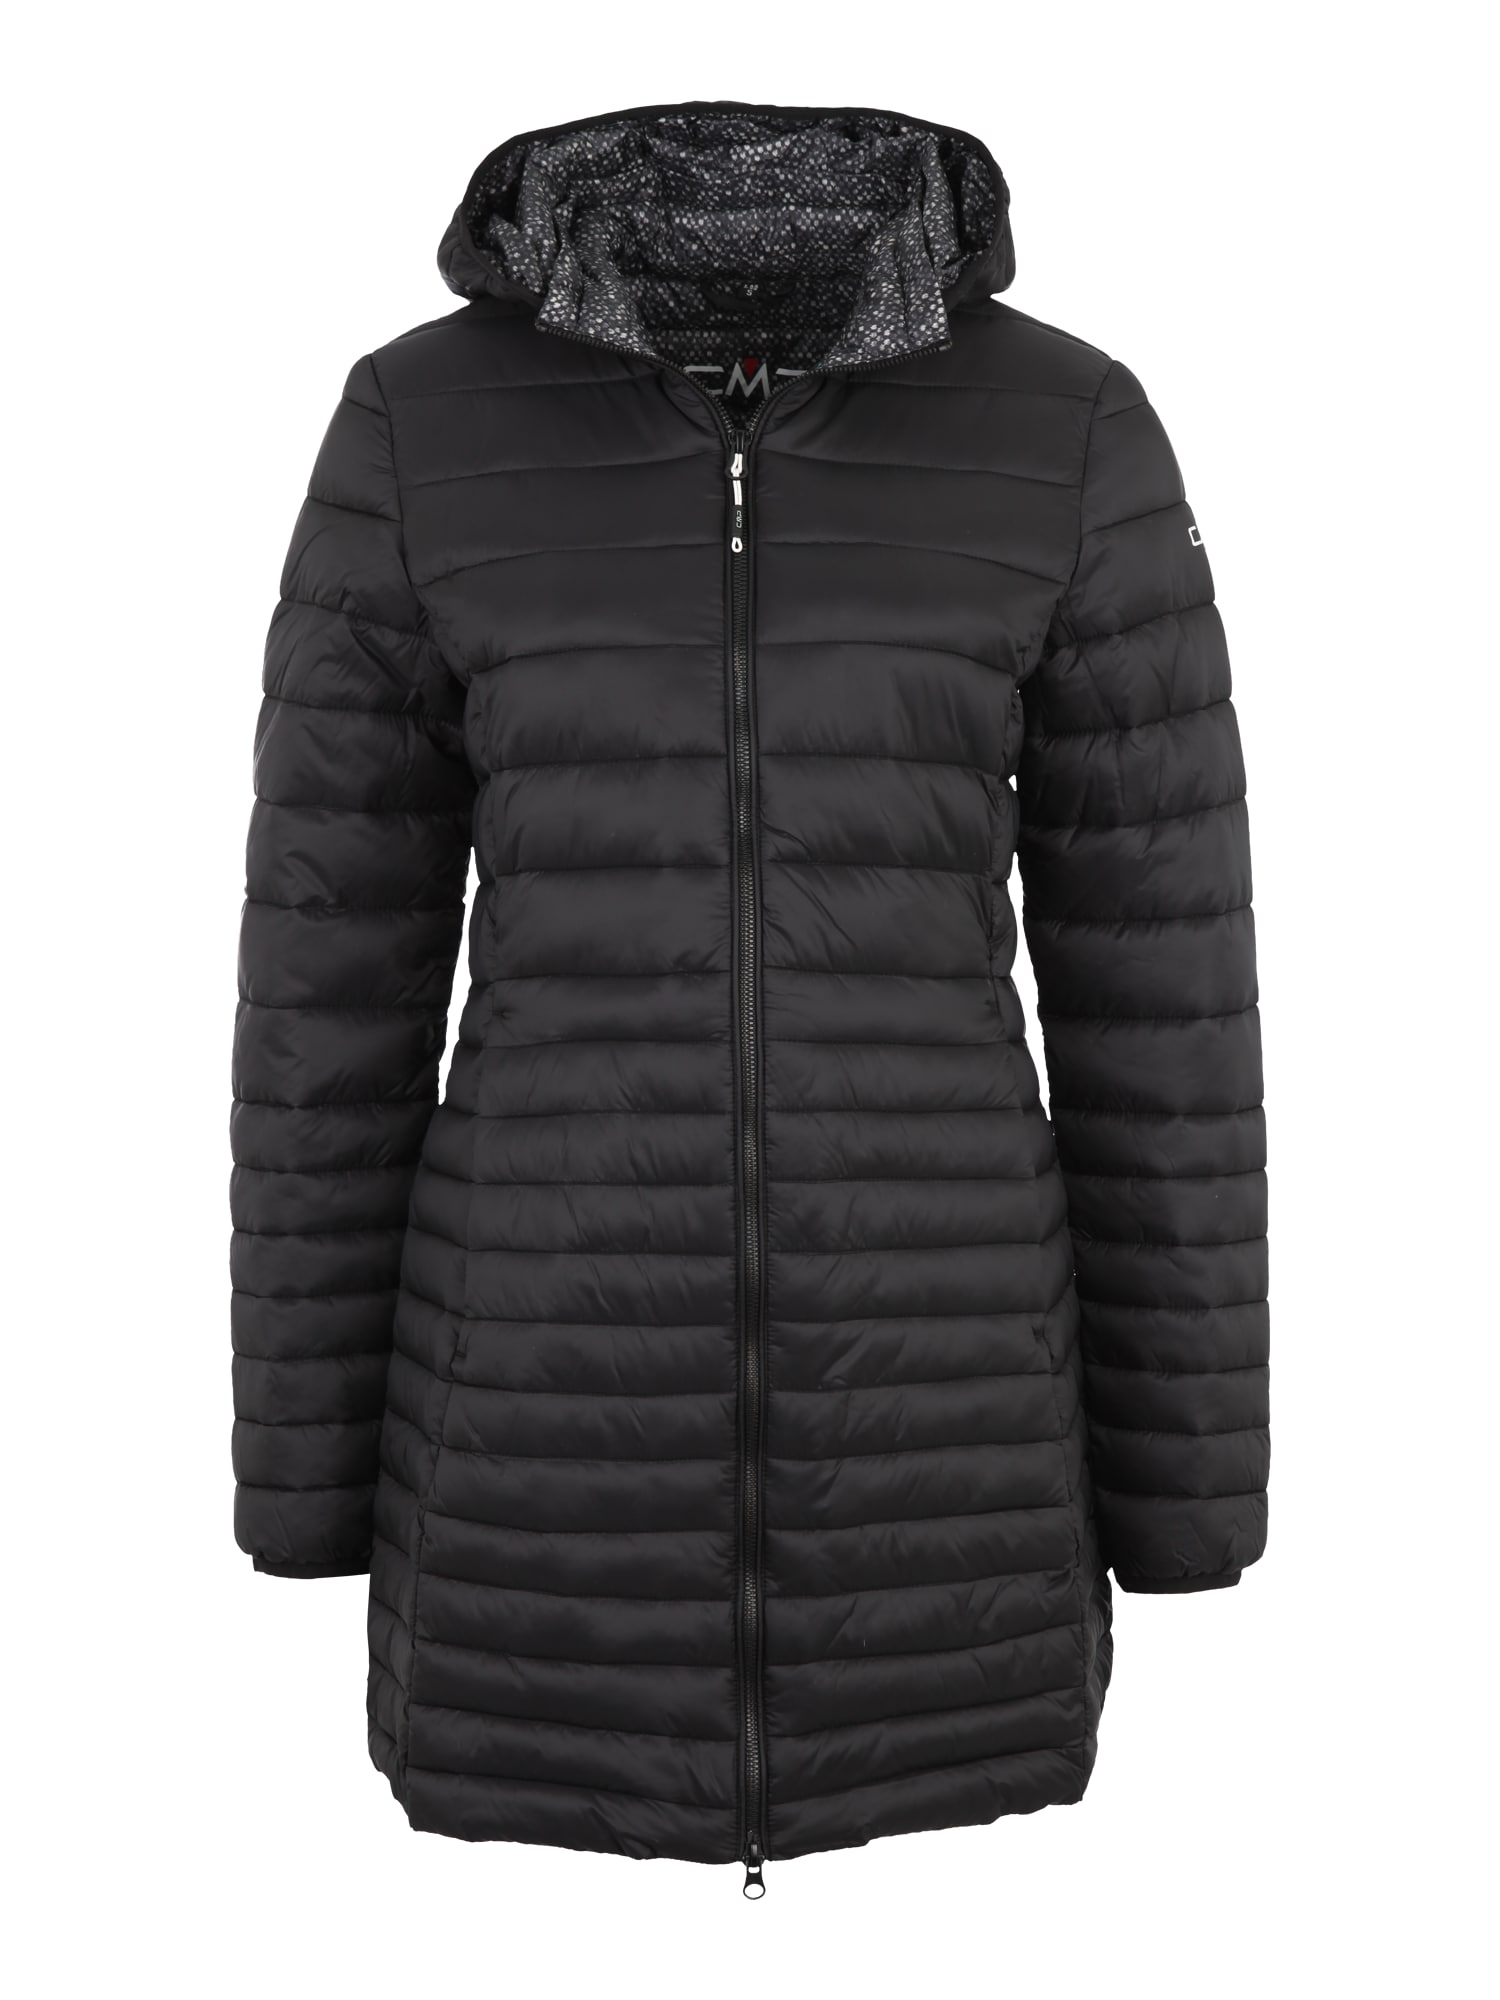 CMP Laisvalaikio paltas 'FIX HOOD' juoda